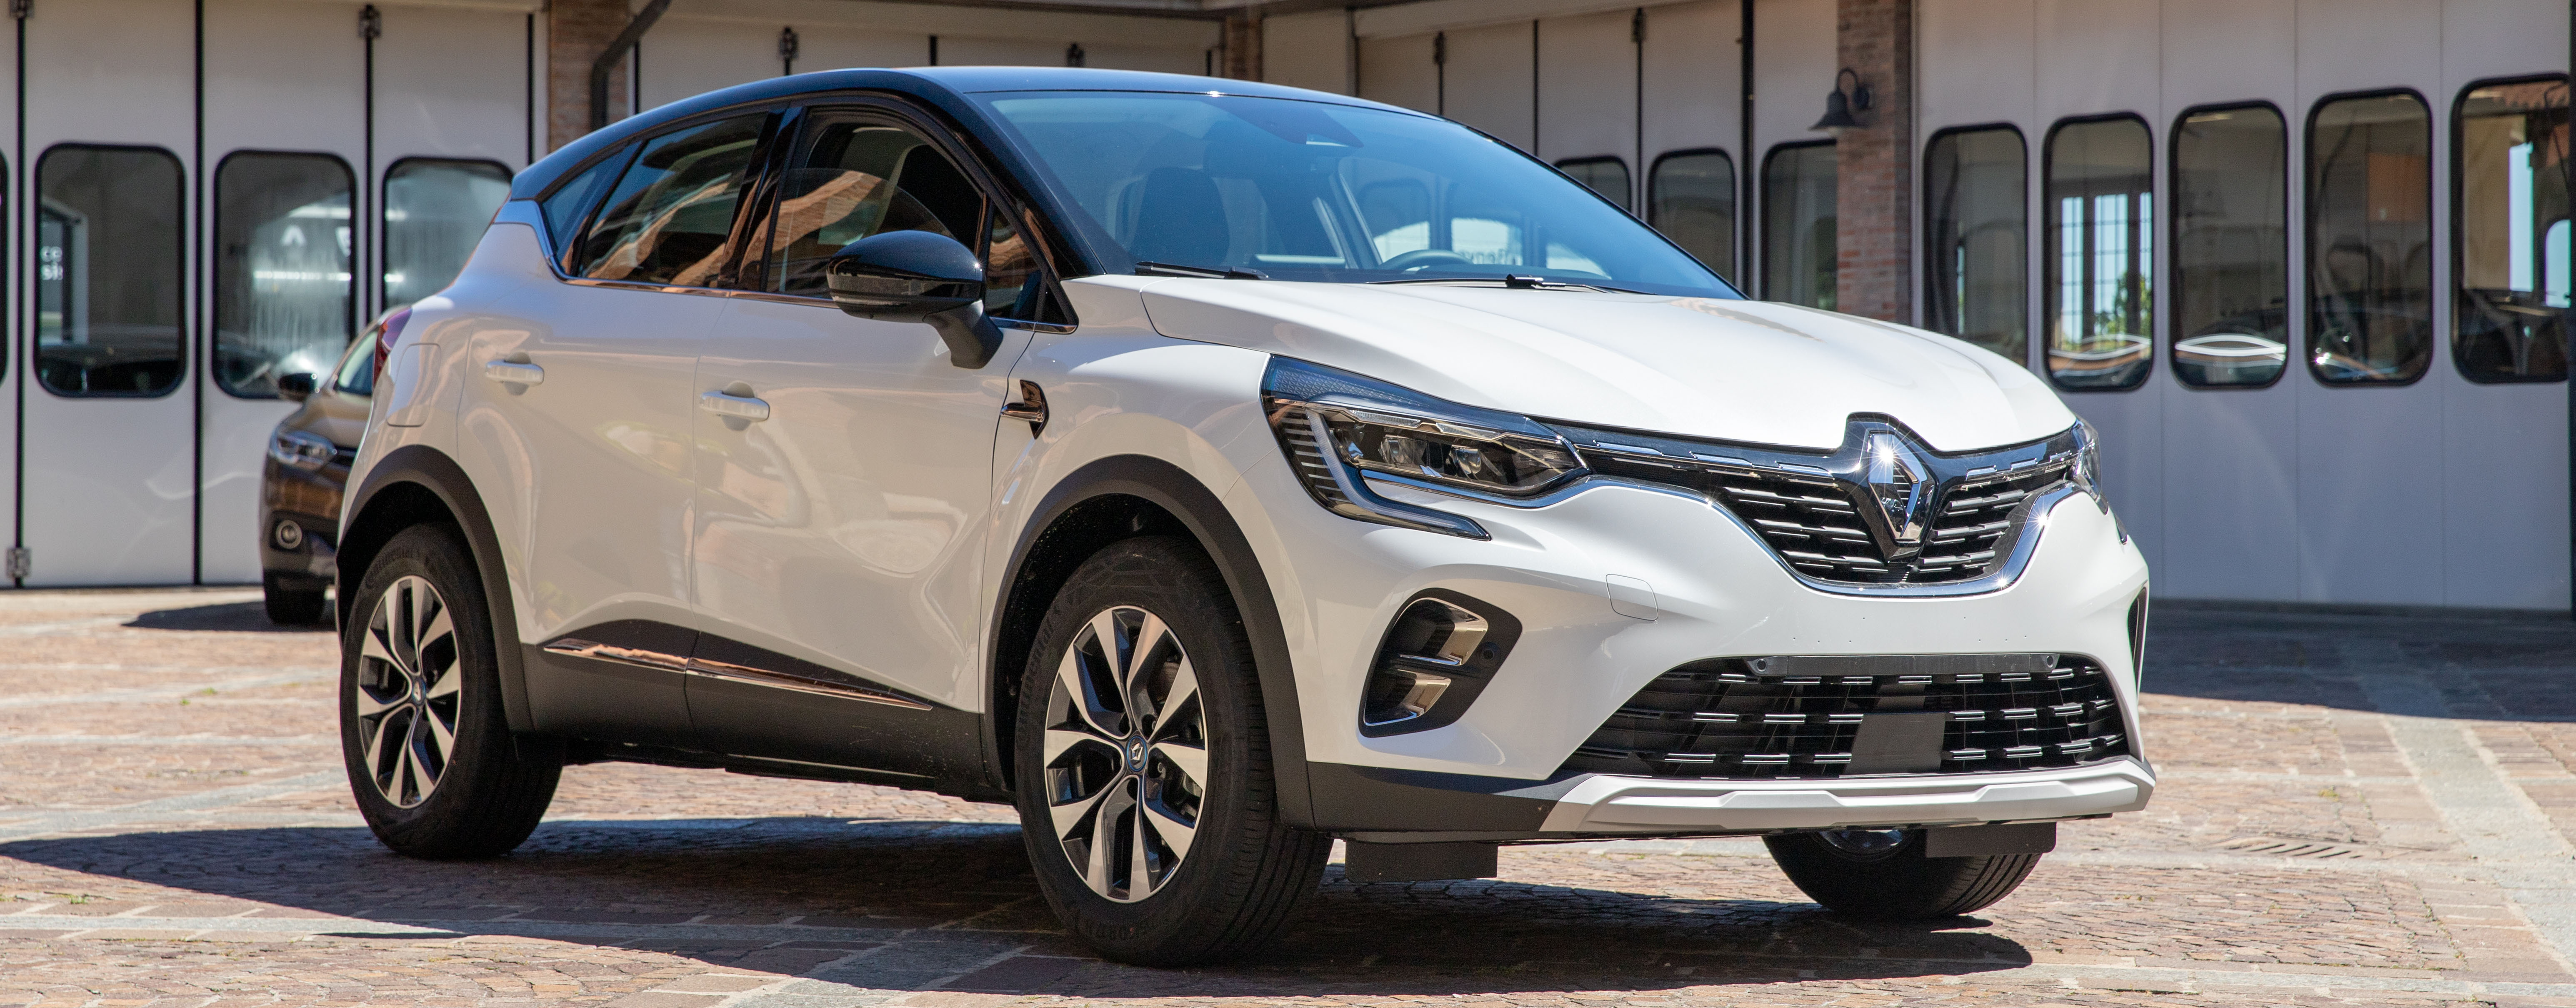 Renault Captur KM0